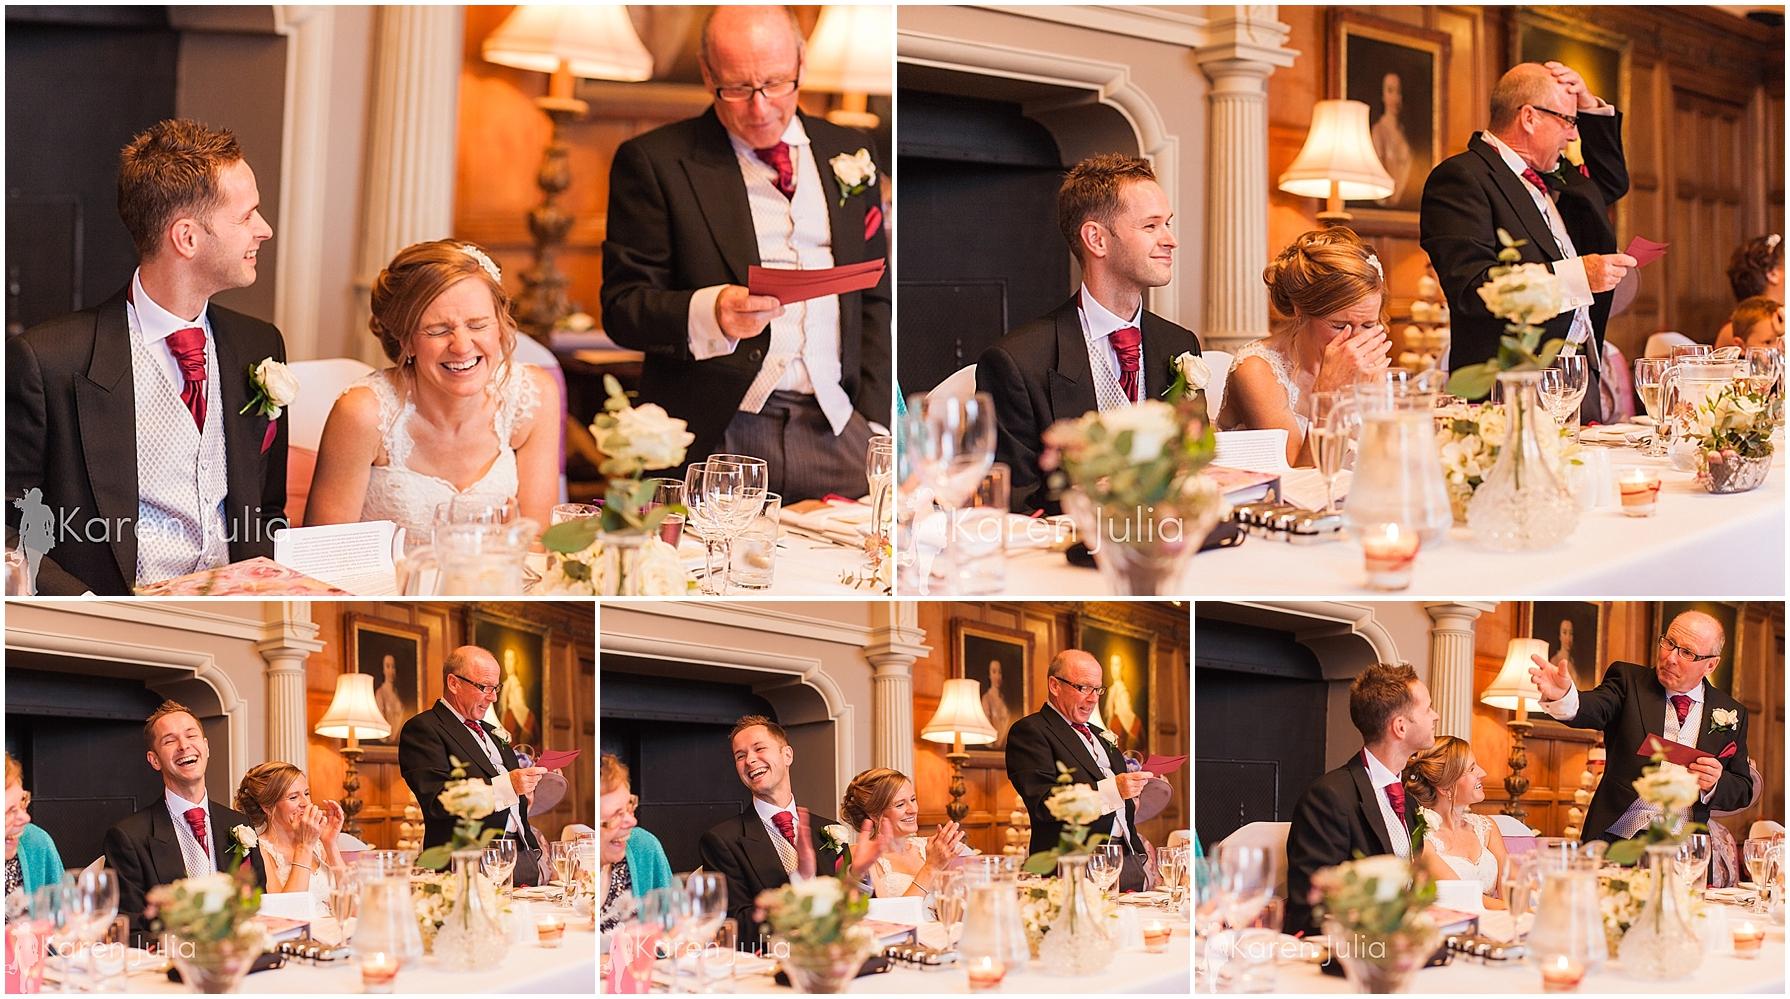 Arley-Hall-Winter-Wedding-Photography-17